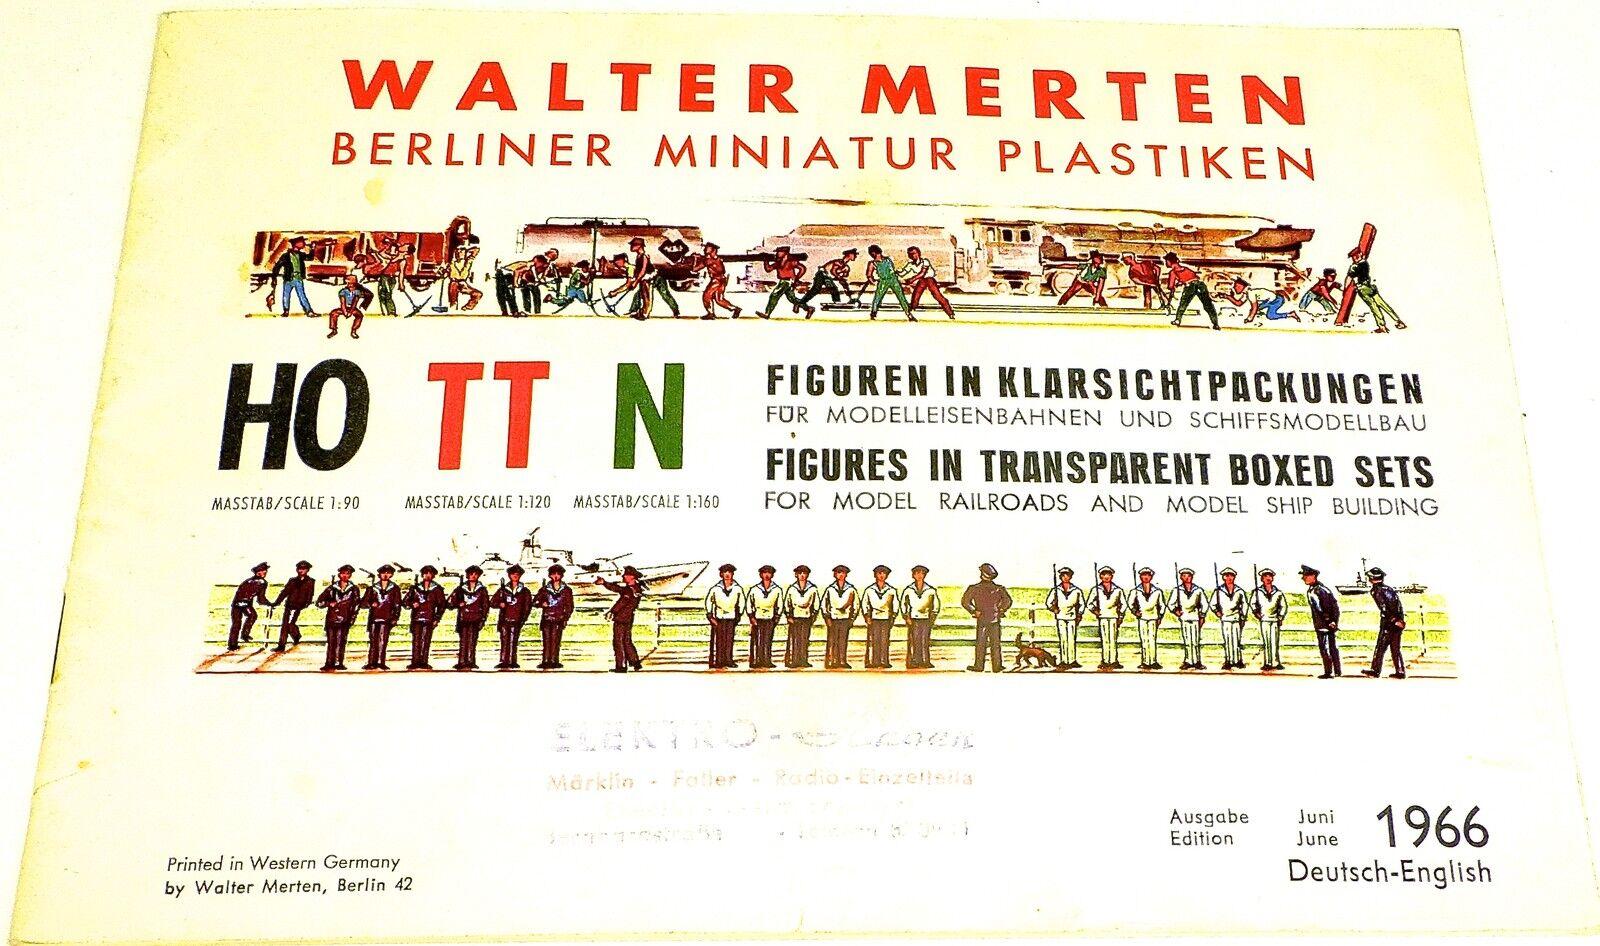 Walter Merten di Berlino Miniatura Plastiken Catalogo Giugno 1966 Tedesco